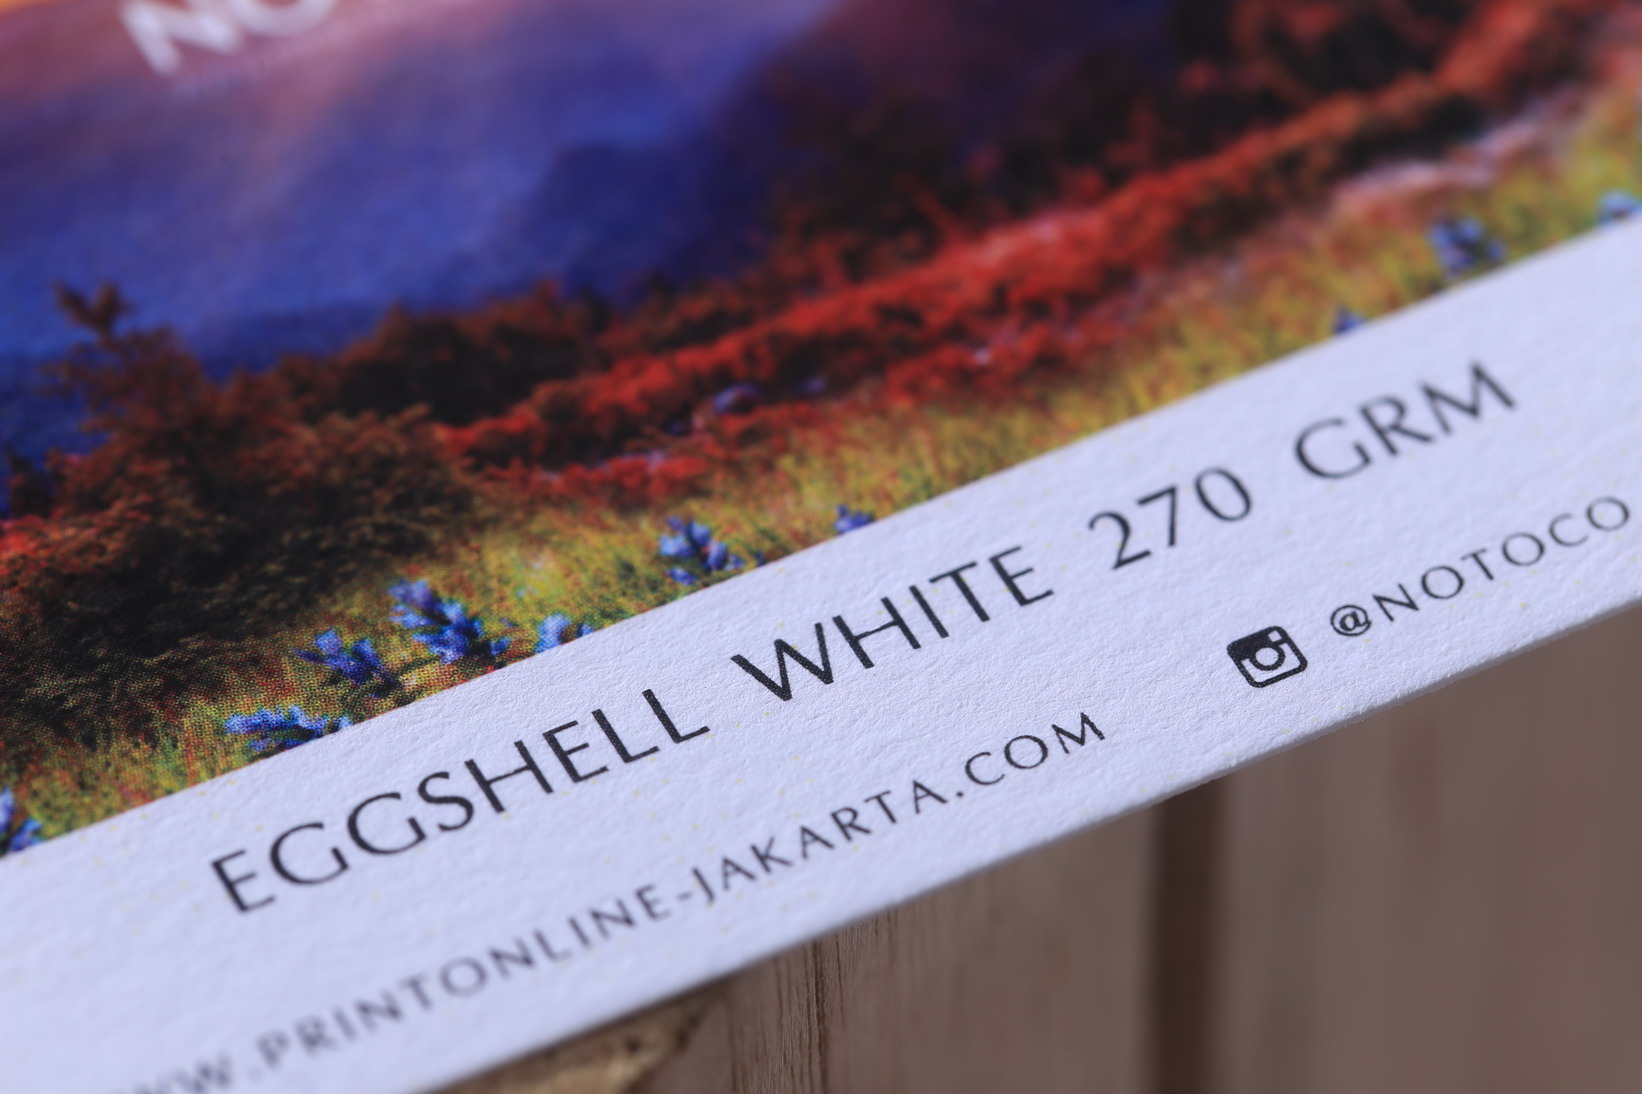 Eggshell White 270 grm